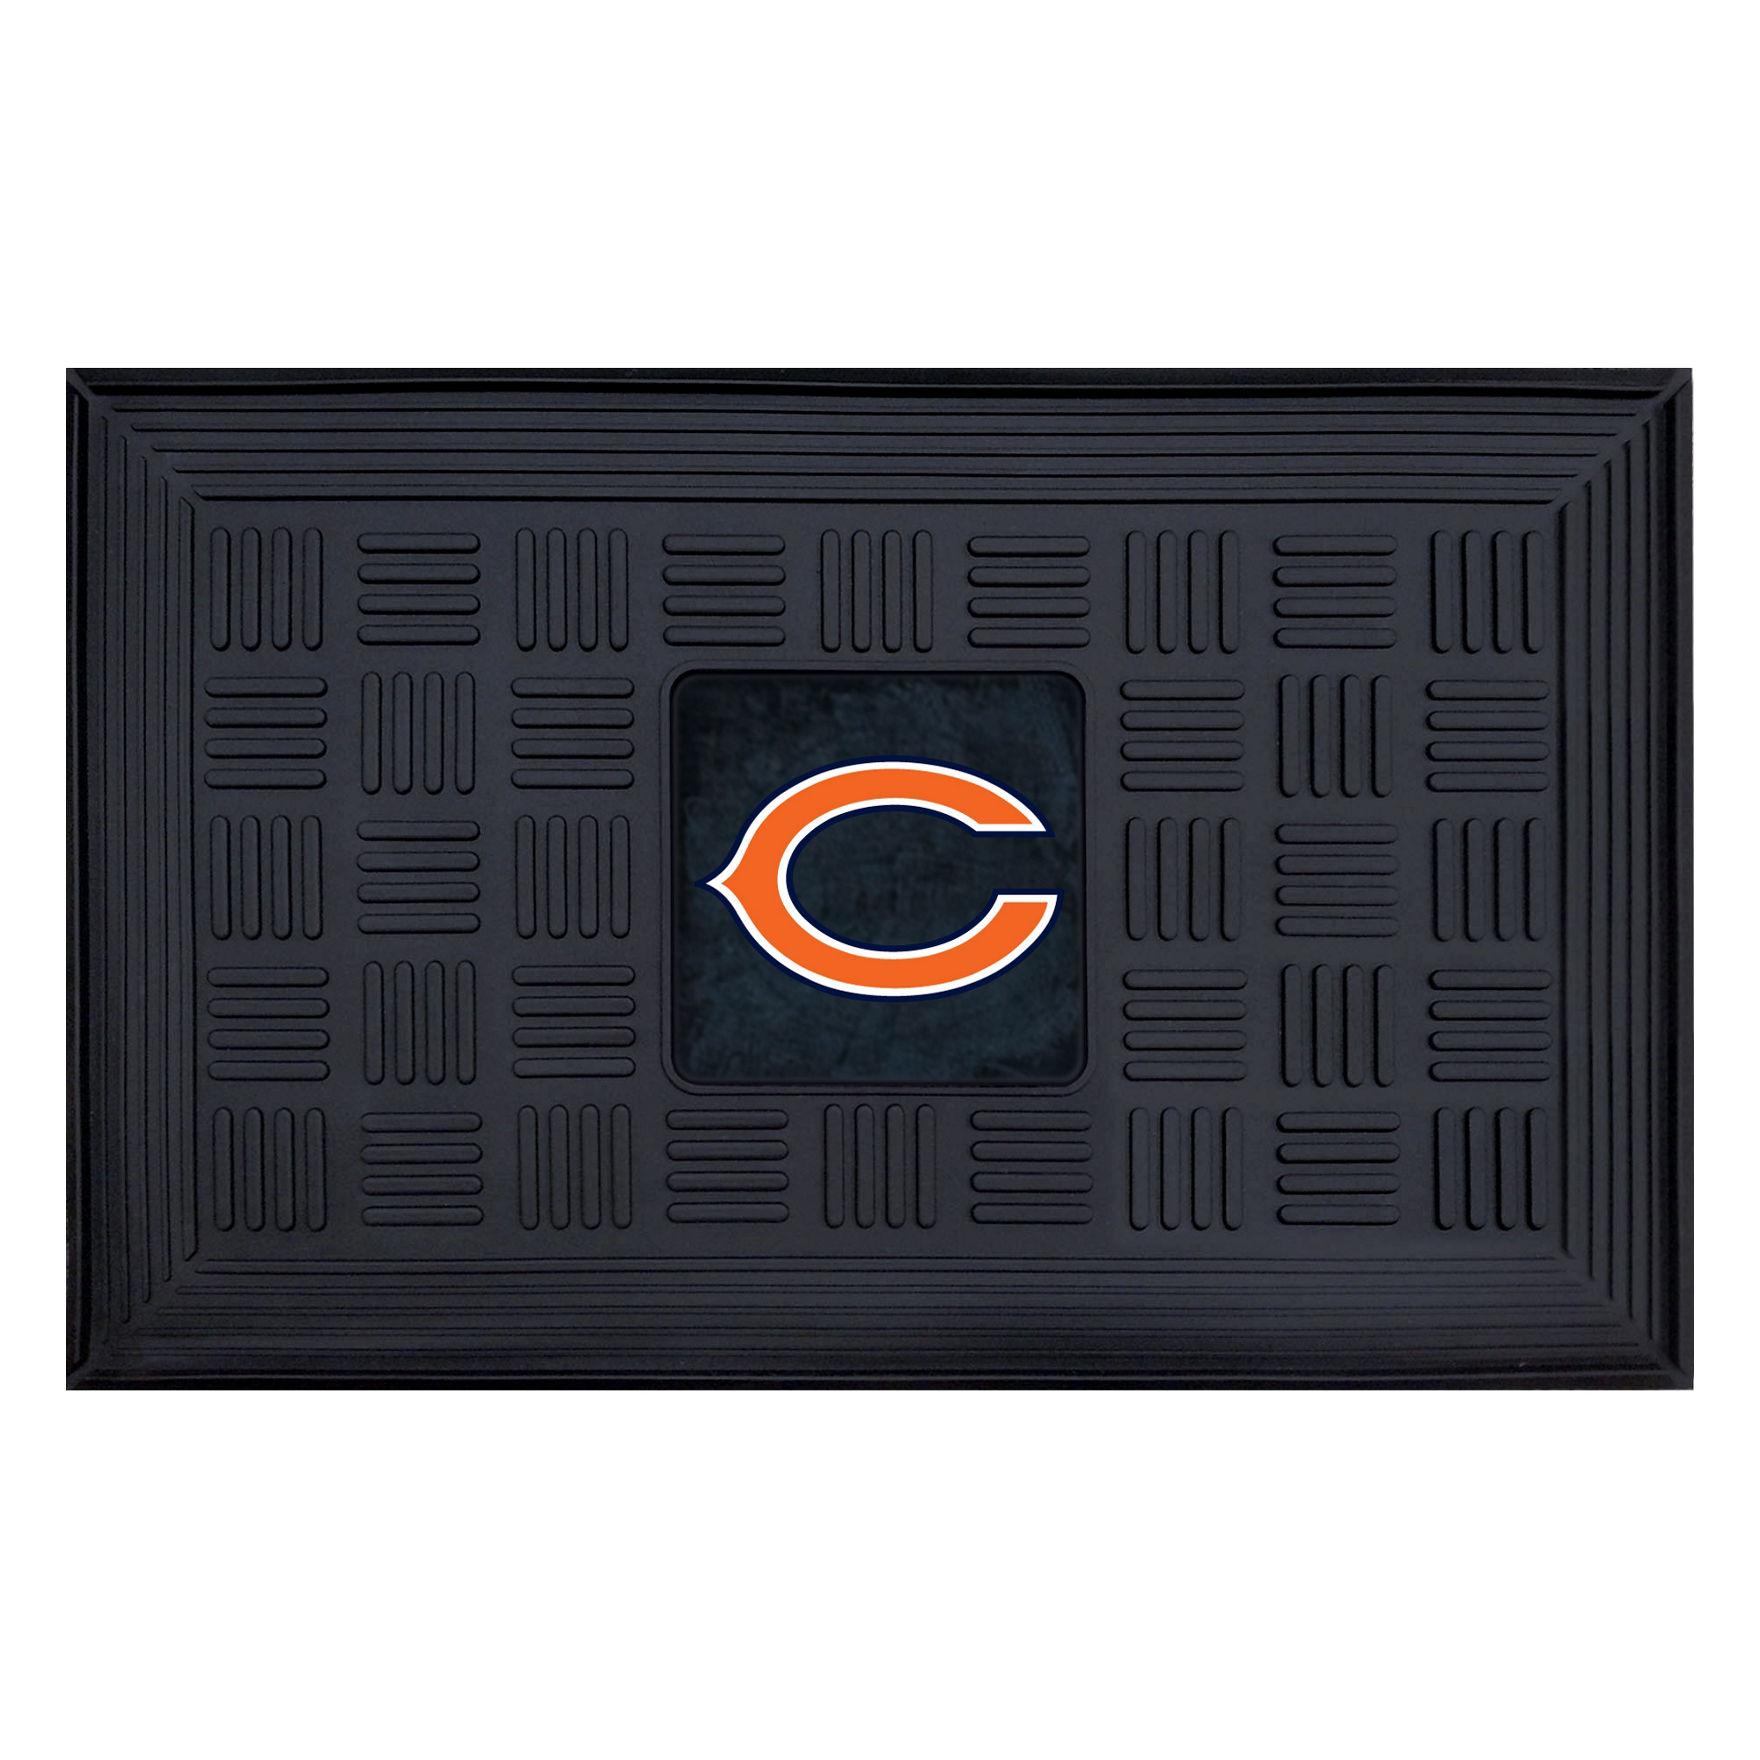 Fanmats Black Outdoor Rugs & Doormats Outdoor Decor Rugs